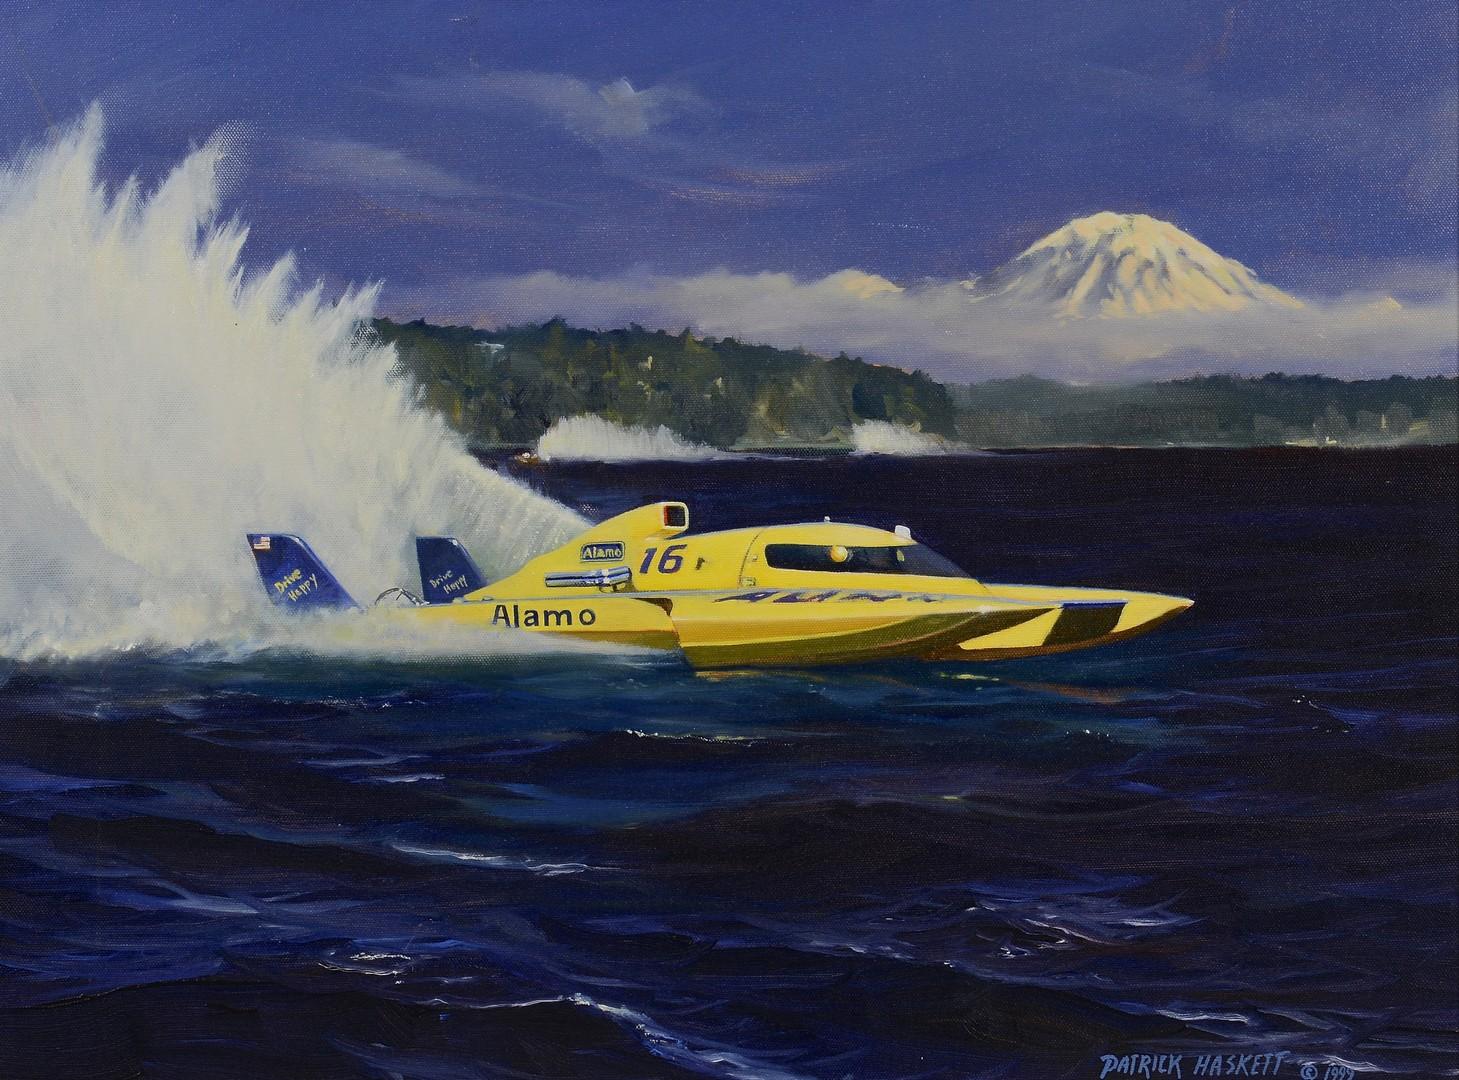 Lot 3832442: Patrick Haskett Oil on Canvas & Study